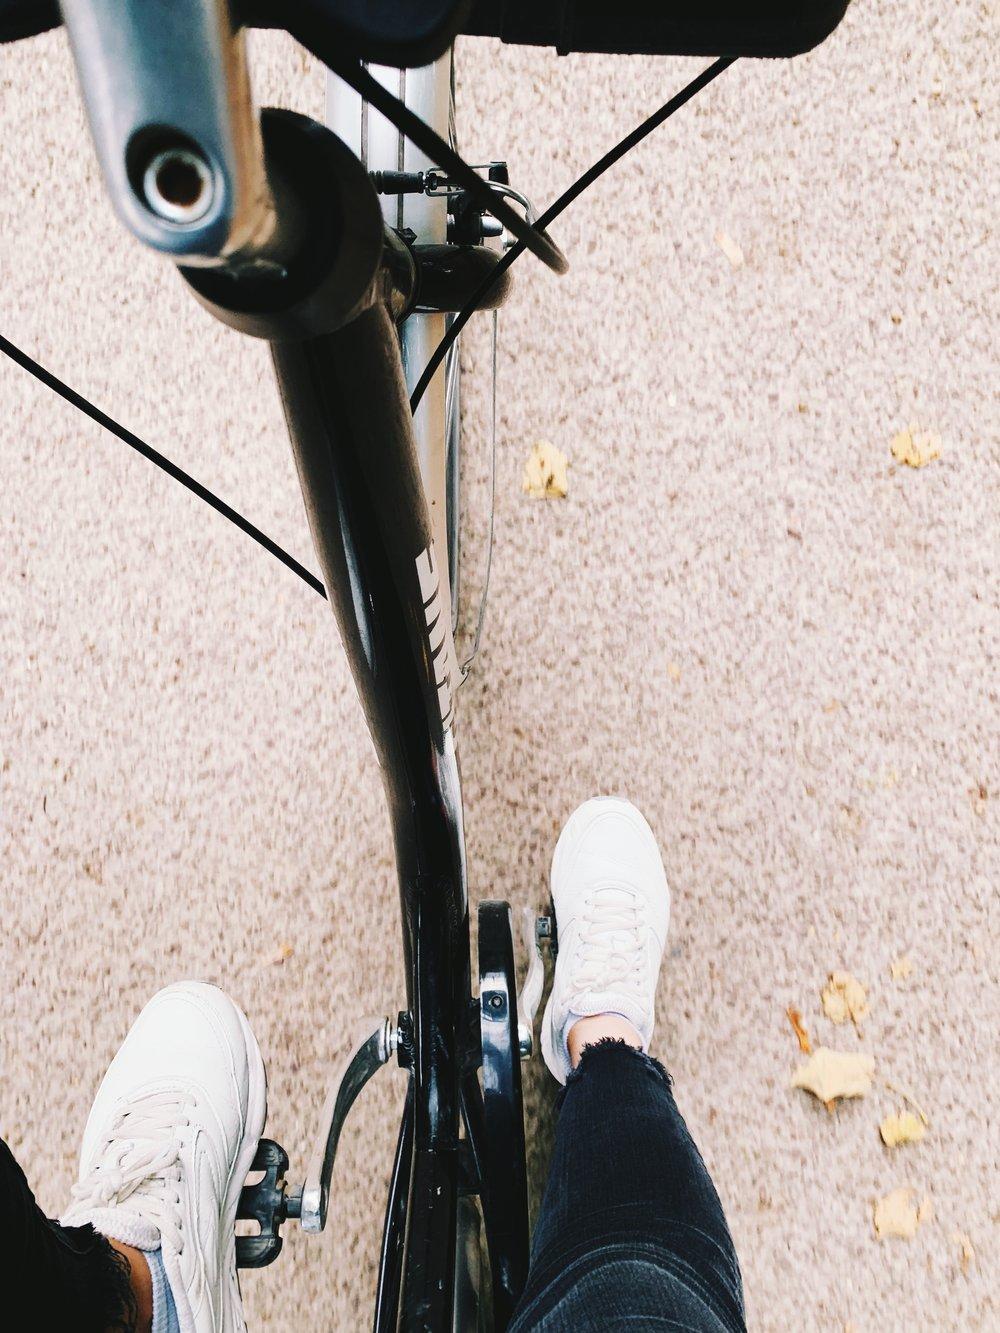 Stretching my legs on a bike.